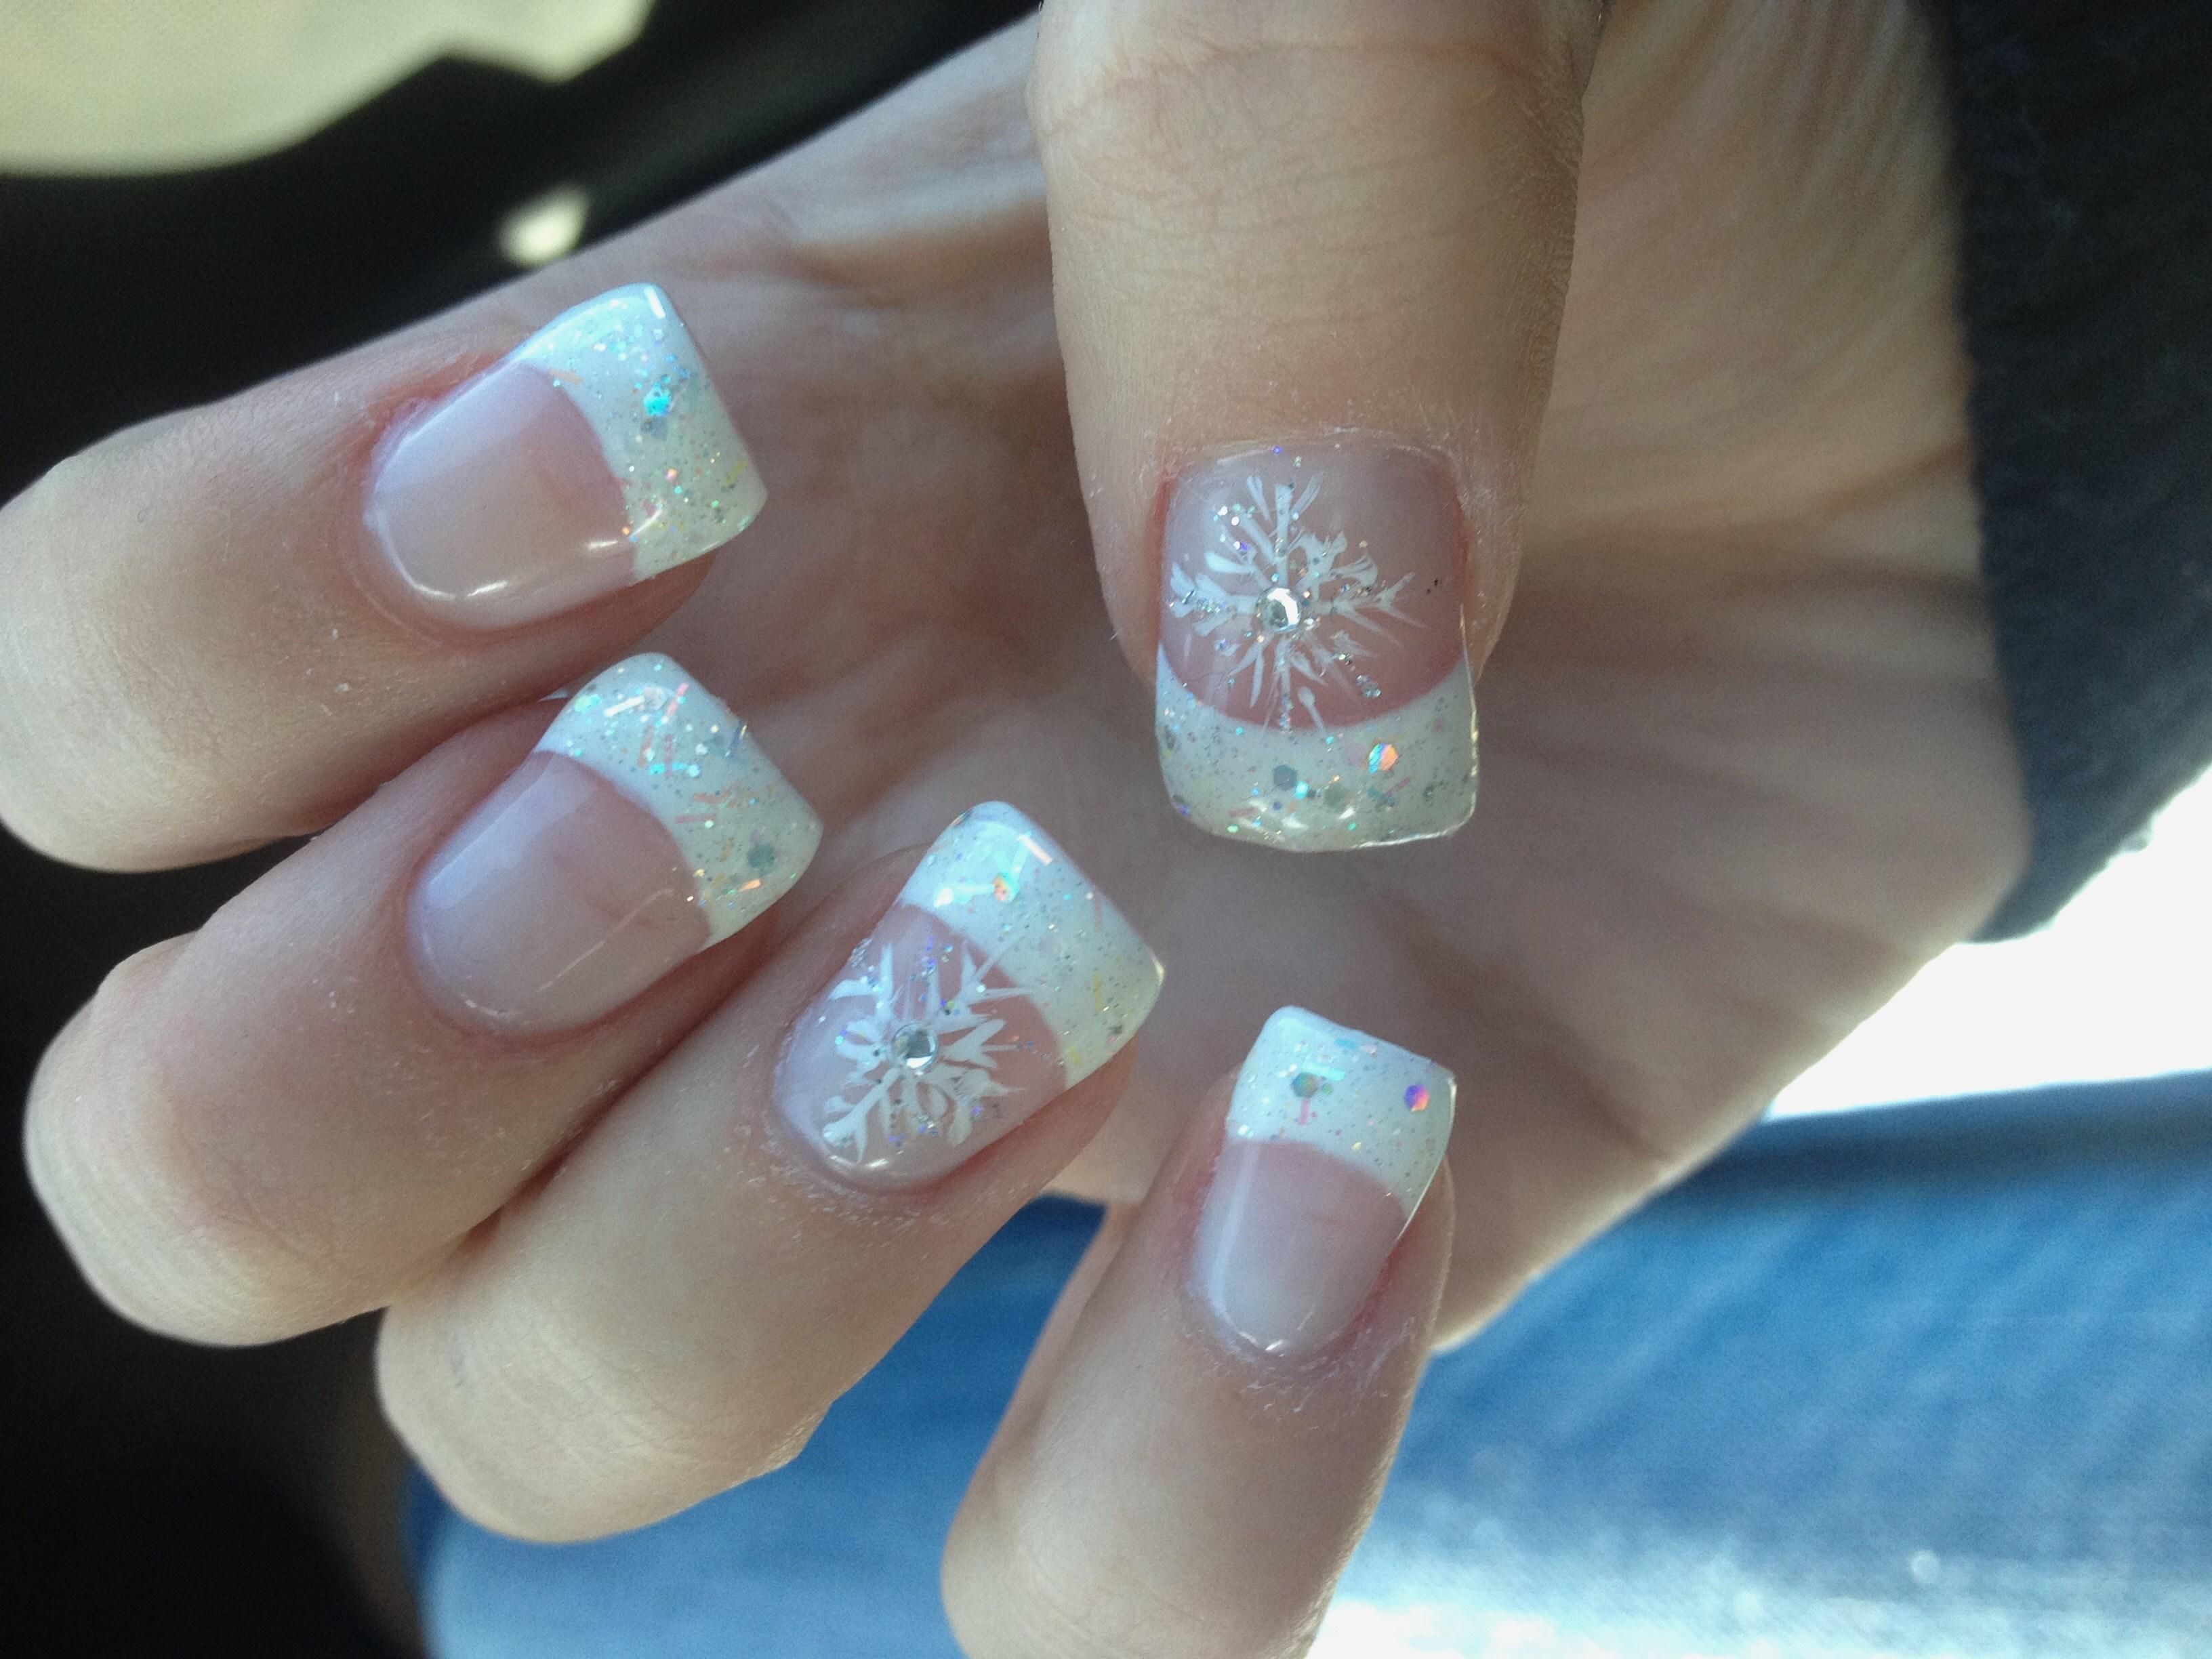 acrylic nails st cloud mn photo - 1